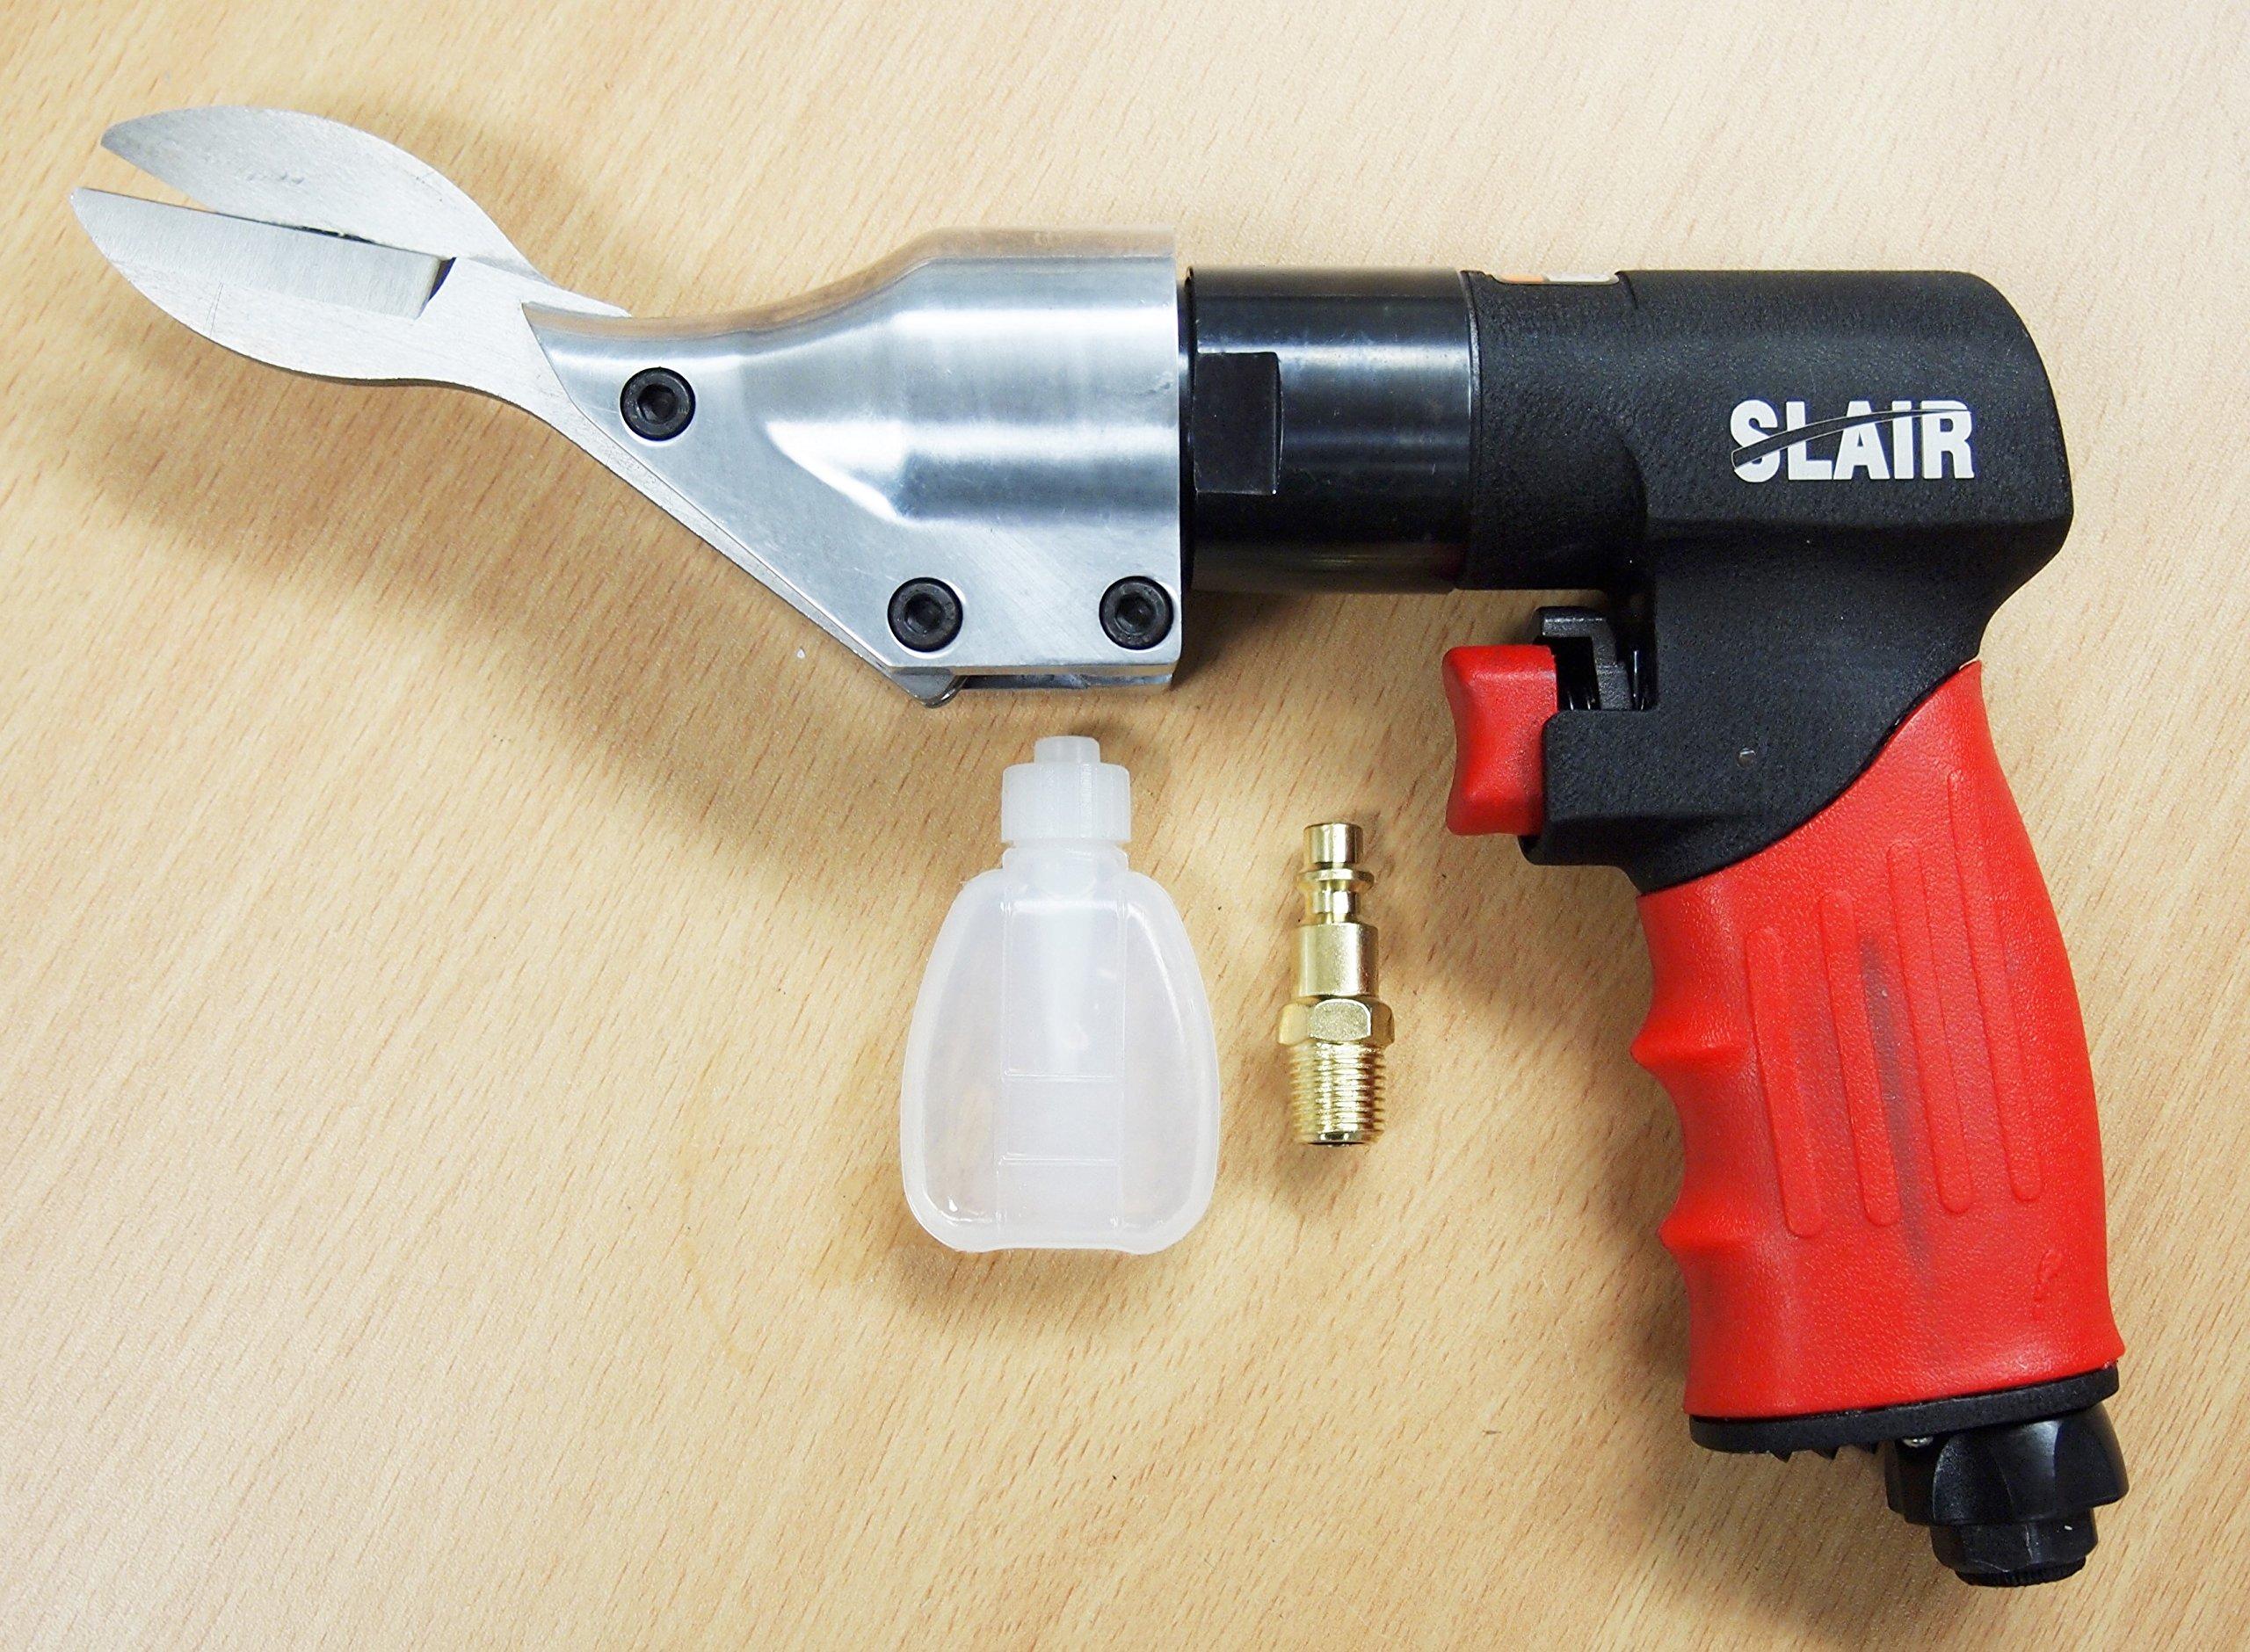 SLAIR Air Pneumatic Pistol Metal Shear Scissors Cutting Tool by SLAIR